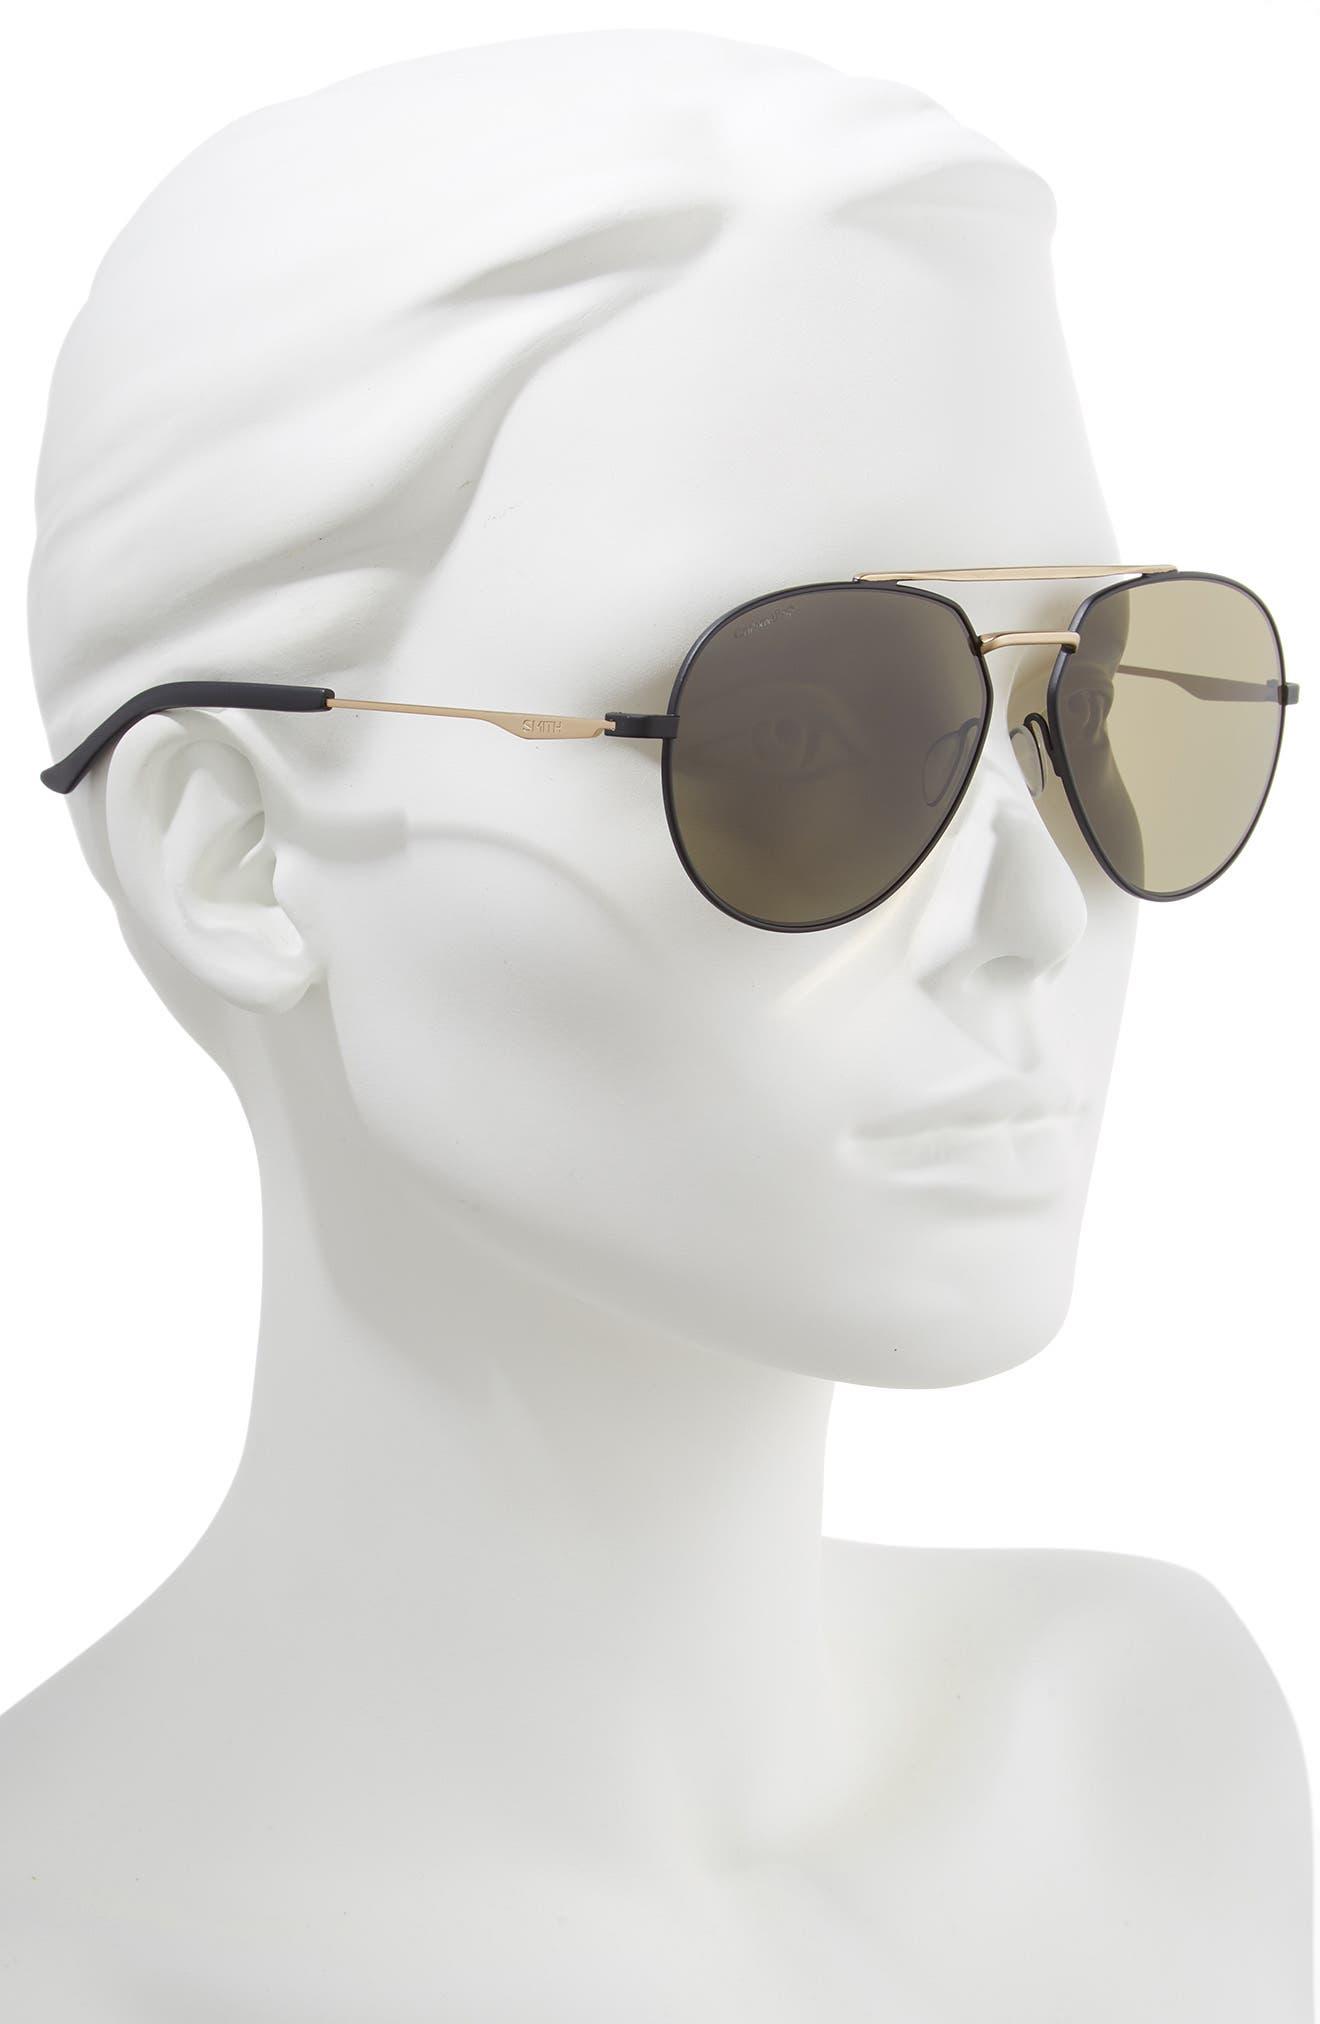 SMITH,                             Westgate 60mm ChromaPop<sup>™</sup> Polarized Aviator Sunglasses,                             Alternate thumbnail 2, color,                             MATTE BLACK/ GOLD